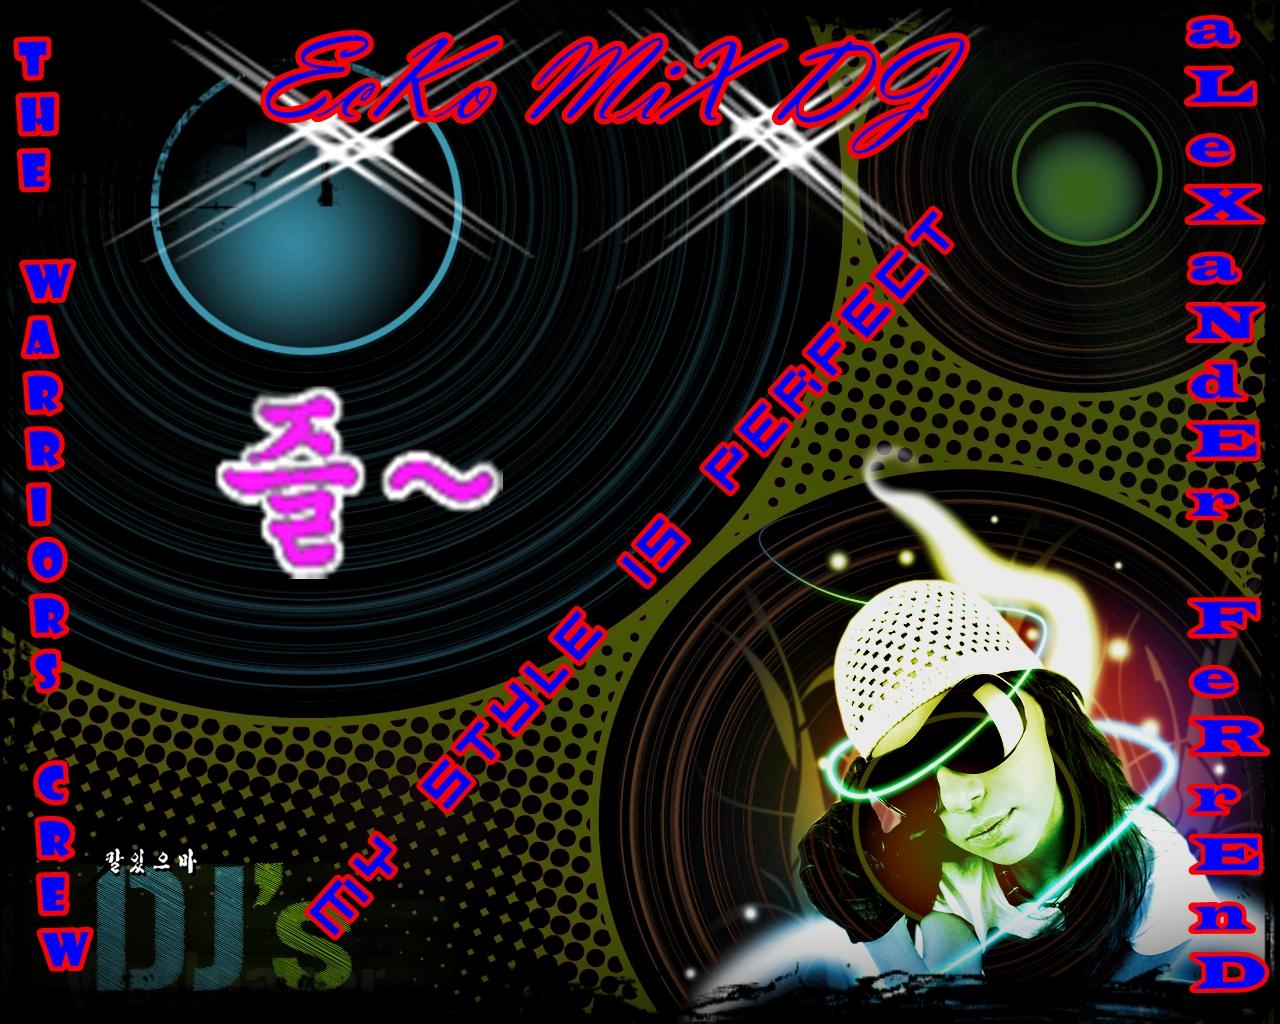 tags ecko brand is check ecko wallpaper ecko marc nokia wallpaper 1280x1024